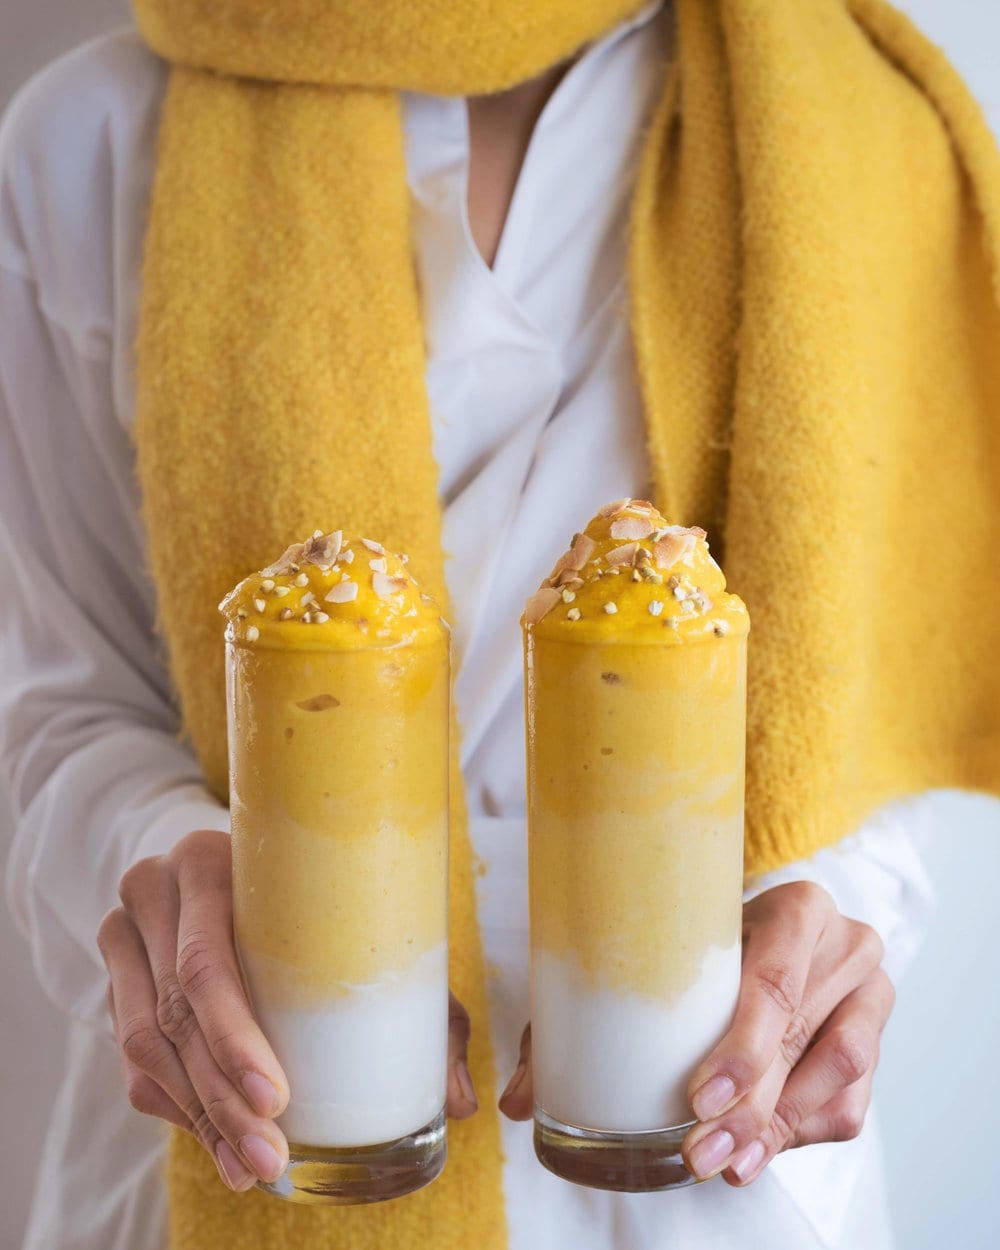 Layered ombreé smoothies: plant-based yogurt + mango smoothie (frozen mango, frozen zucchini, plant-based milk)